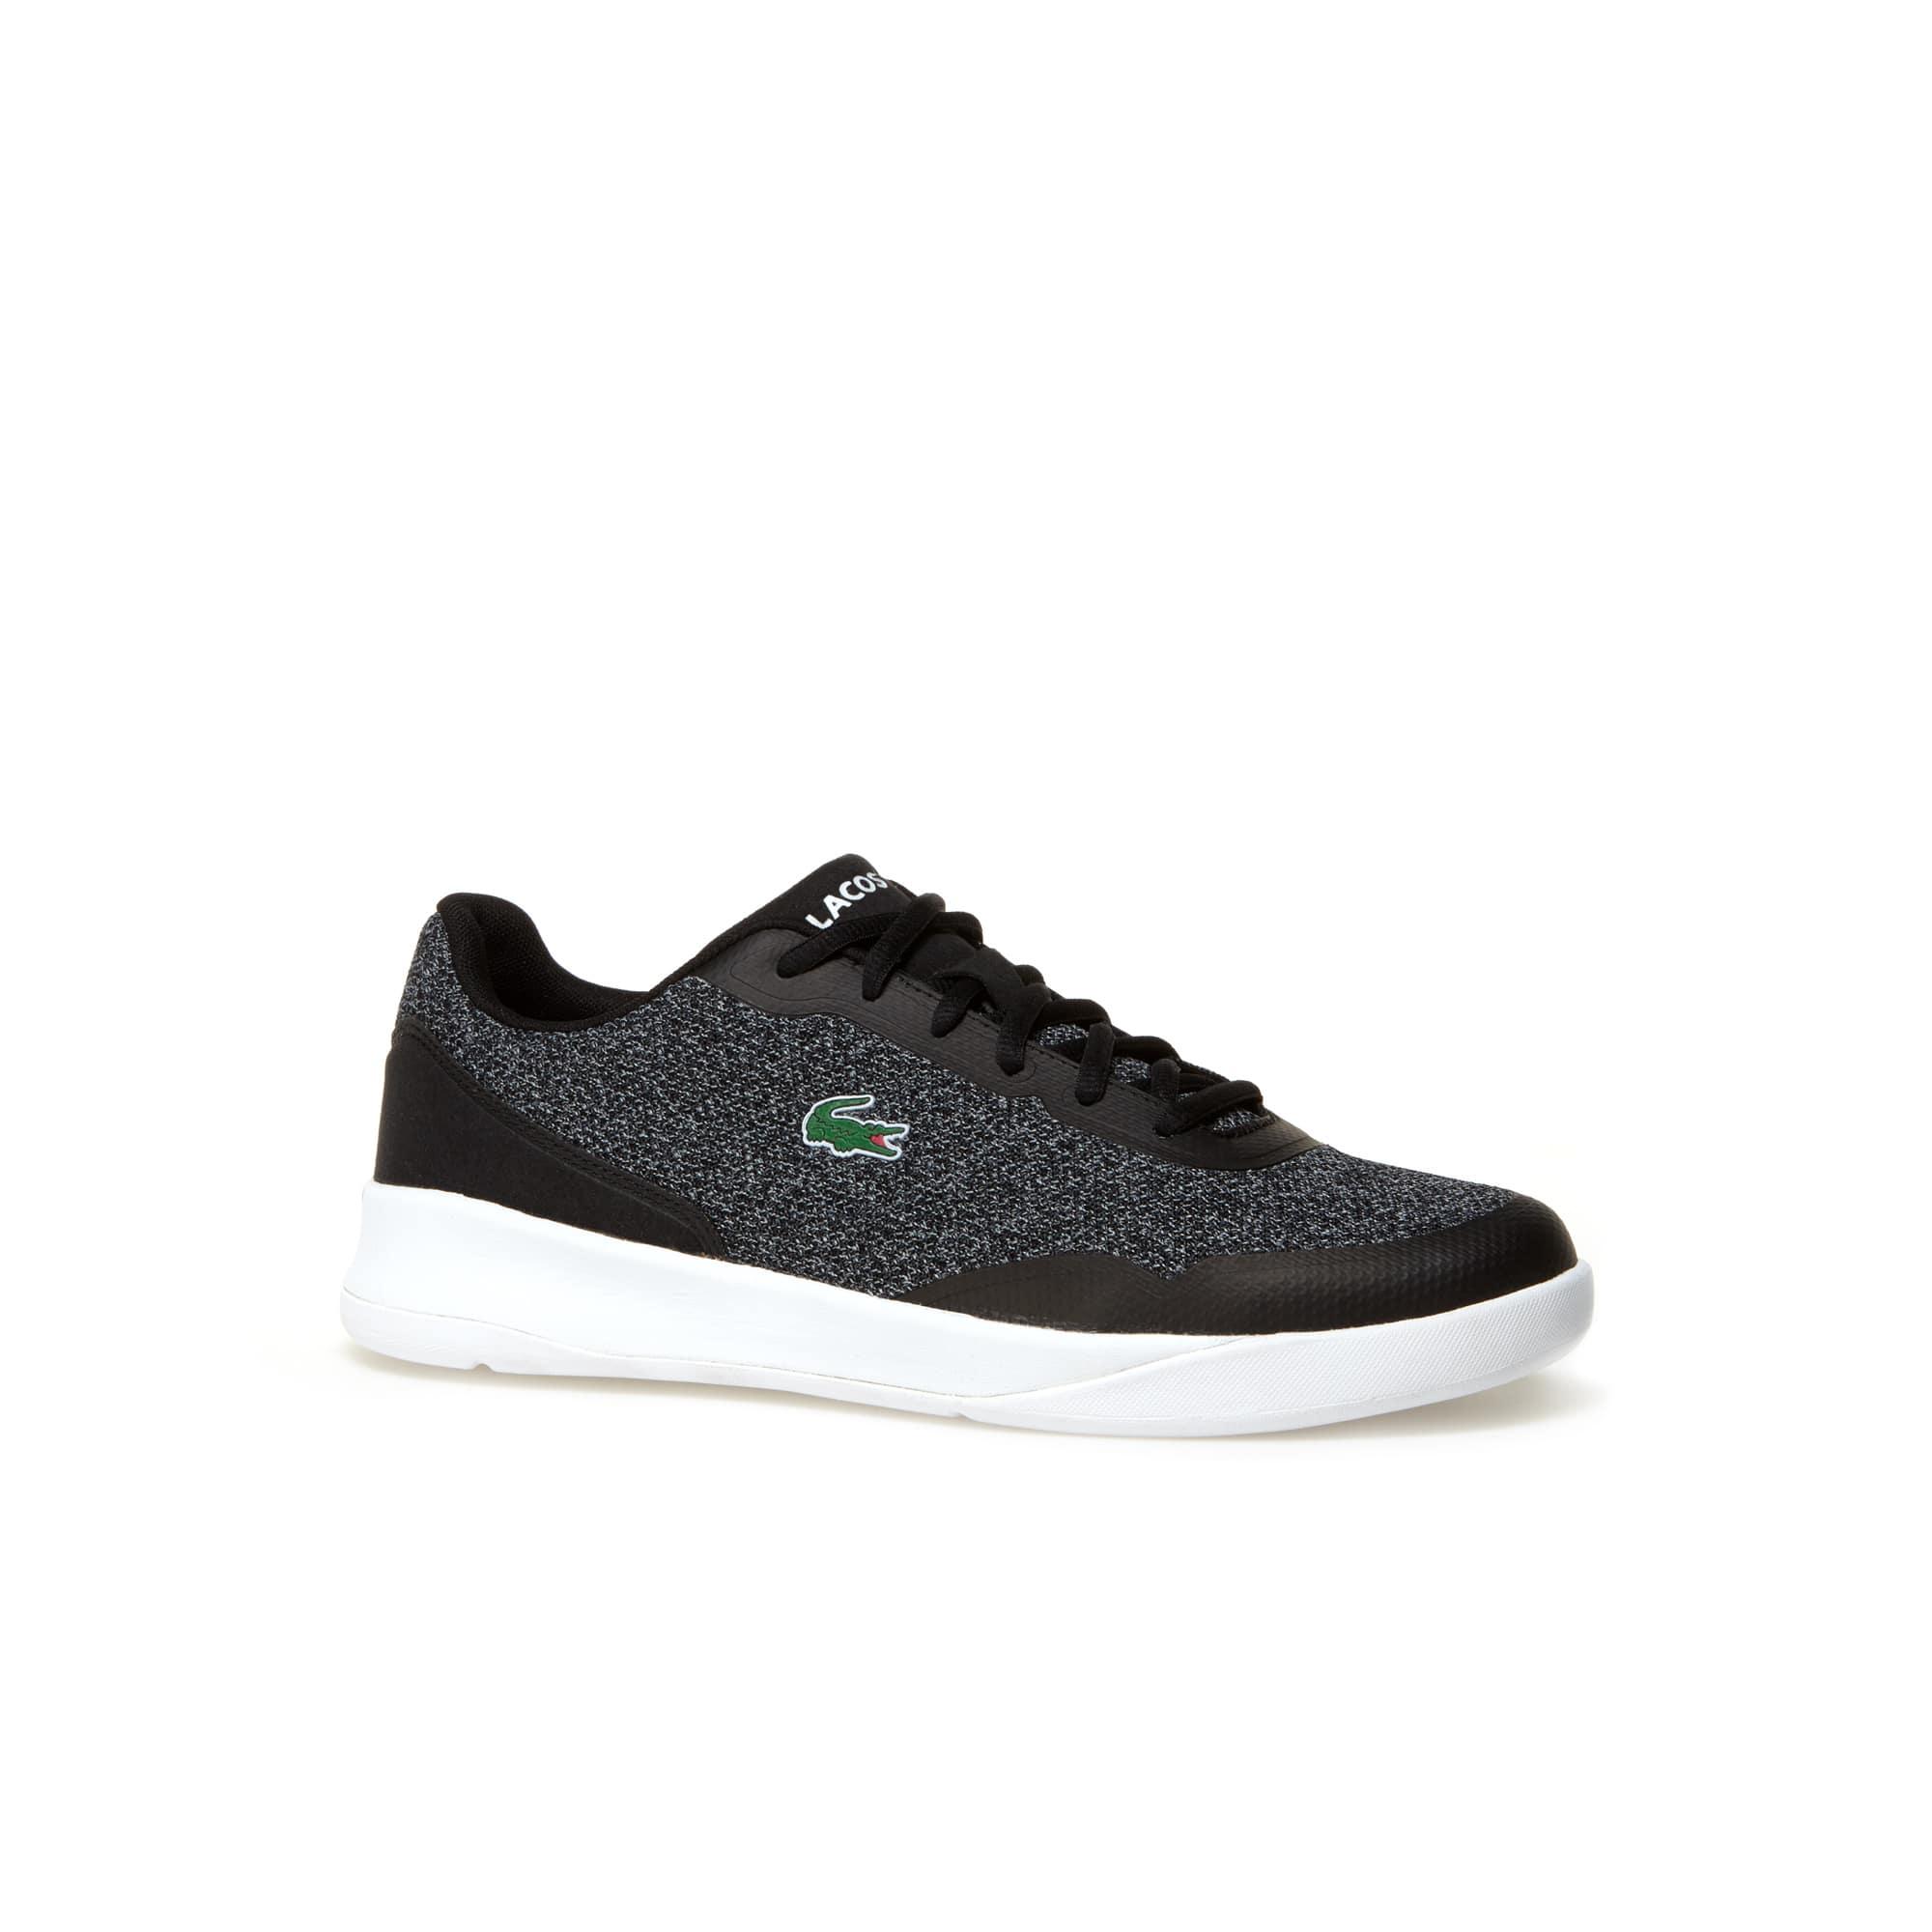 Sneakers LT Spirit en textile